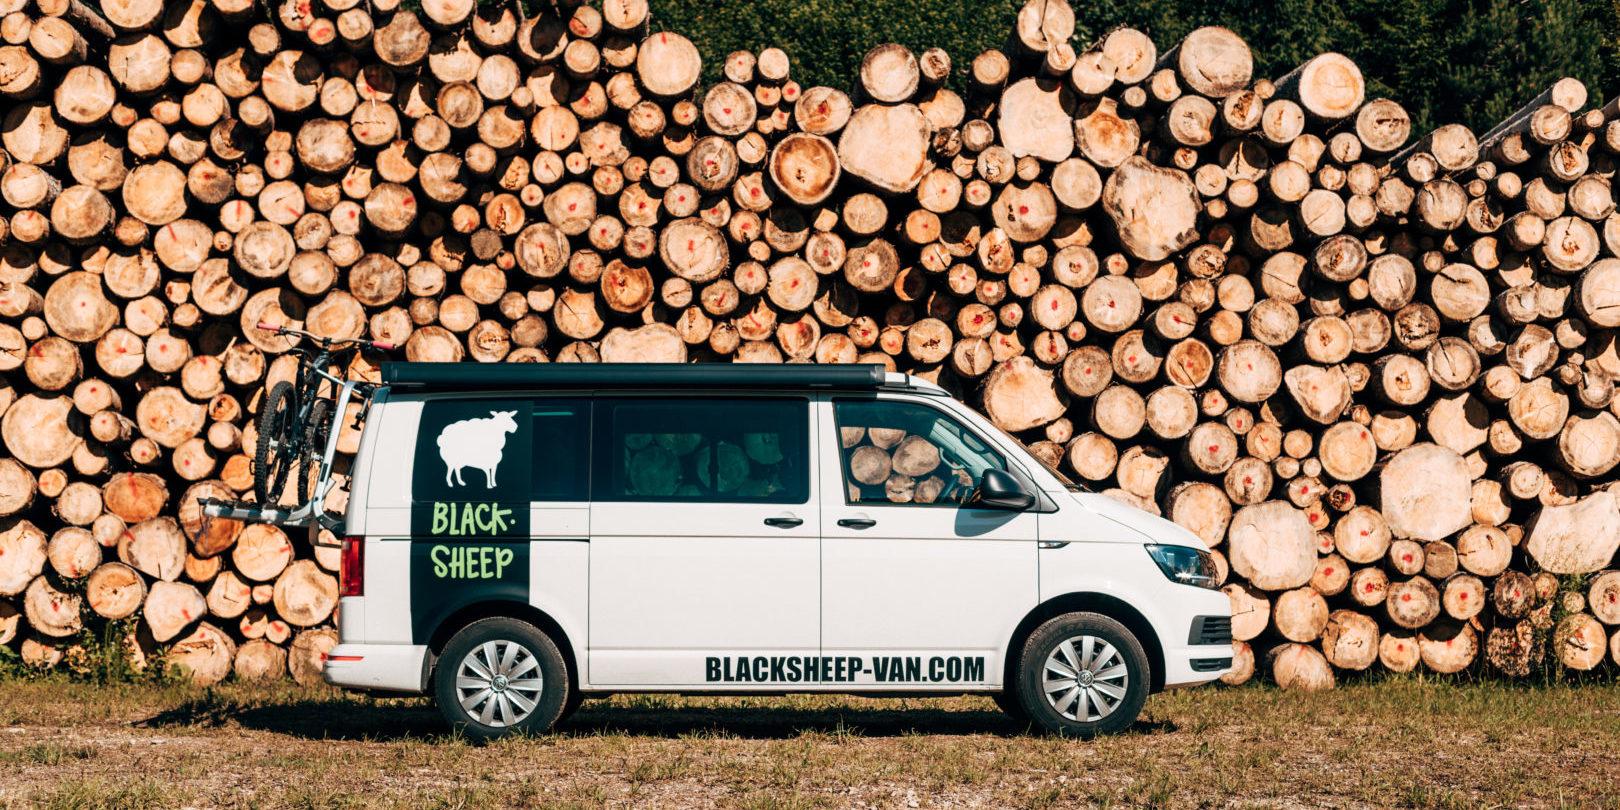 Corsica Frankrijk campervans Blacksheep CALIFORNIA BLACKSHEEP natuur houtblokken boomstammen parkeren